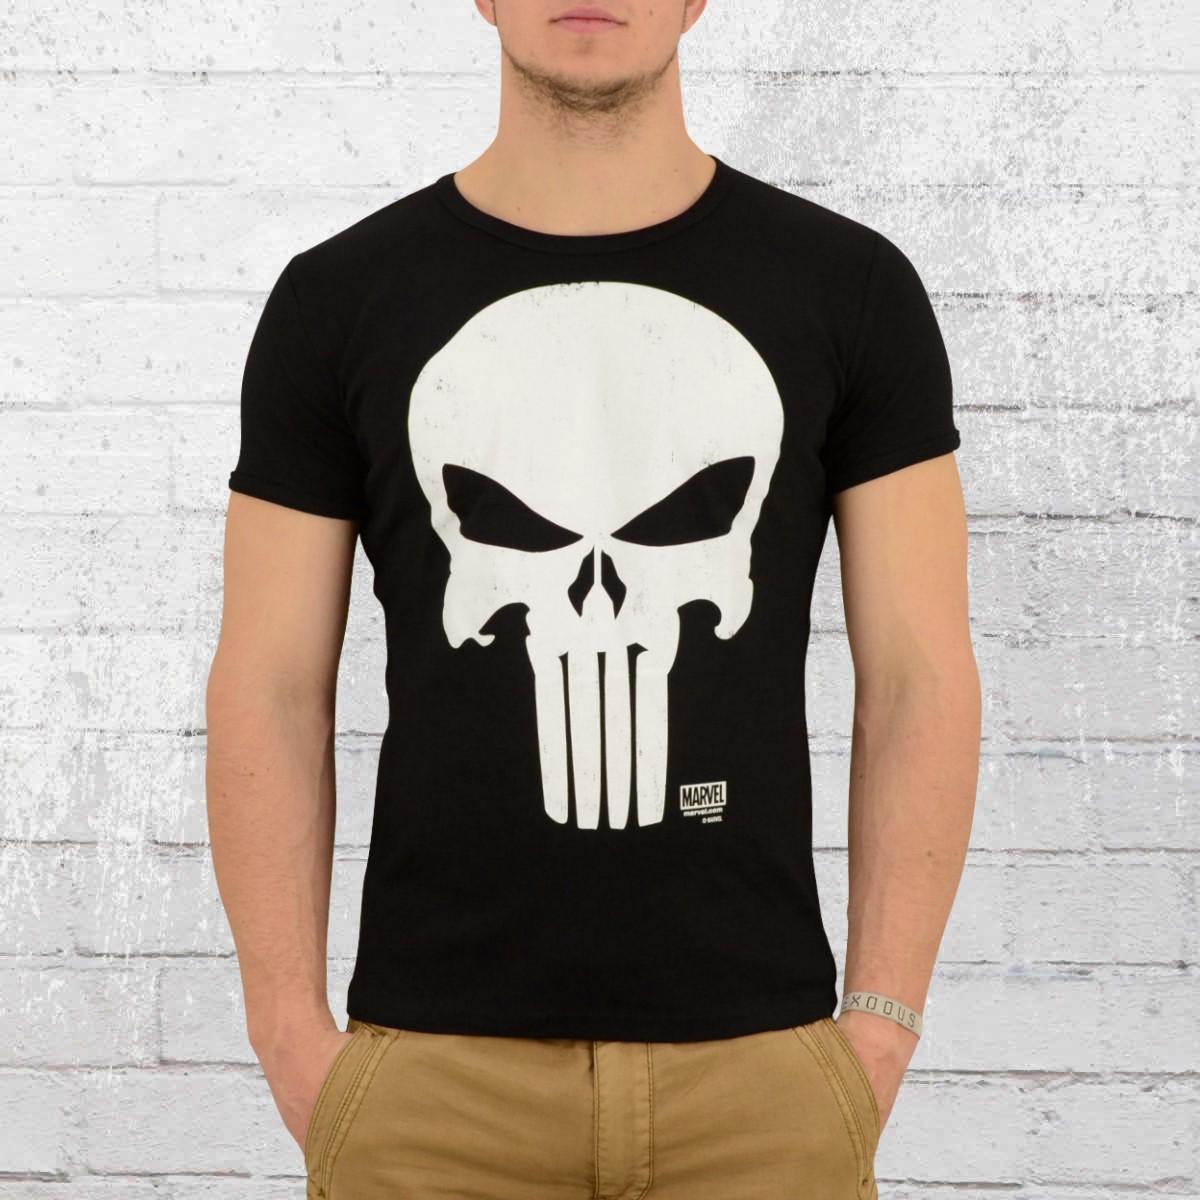 ce011b009 Marvel Comics Punisher No Sweat Mens Black T Shirt   Azərbaycan ...